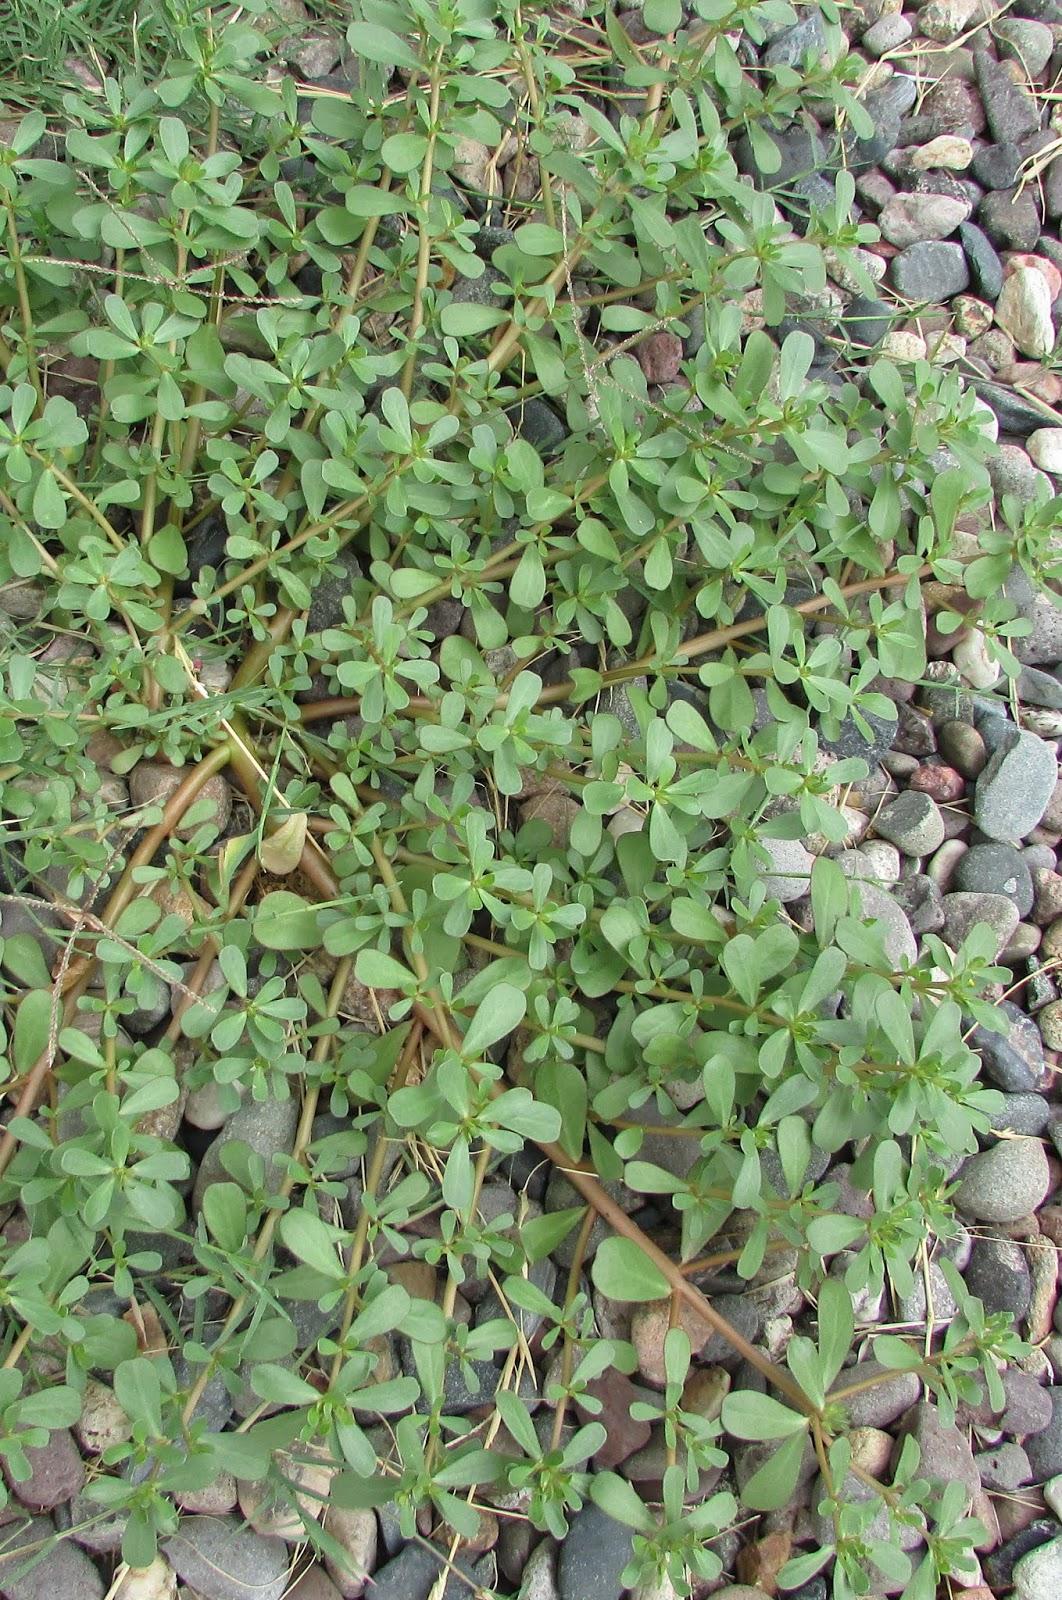 Growing Purslane How To Grow Edible Purslane In The Garden: William & Mary Dyer